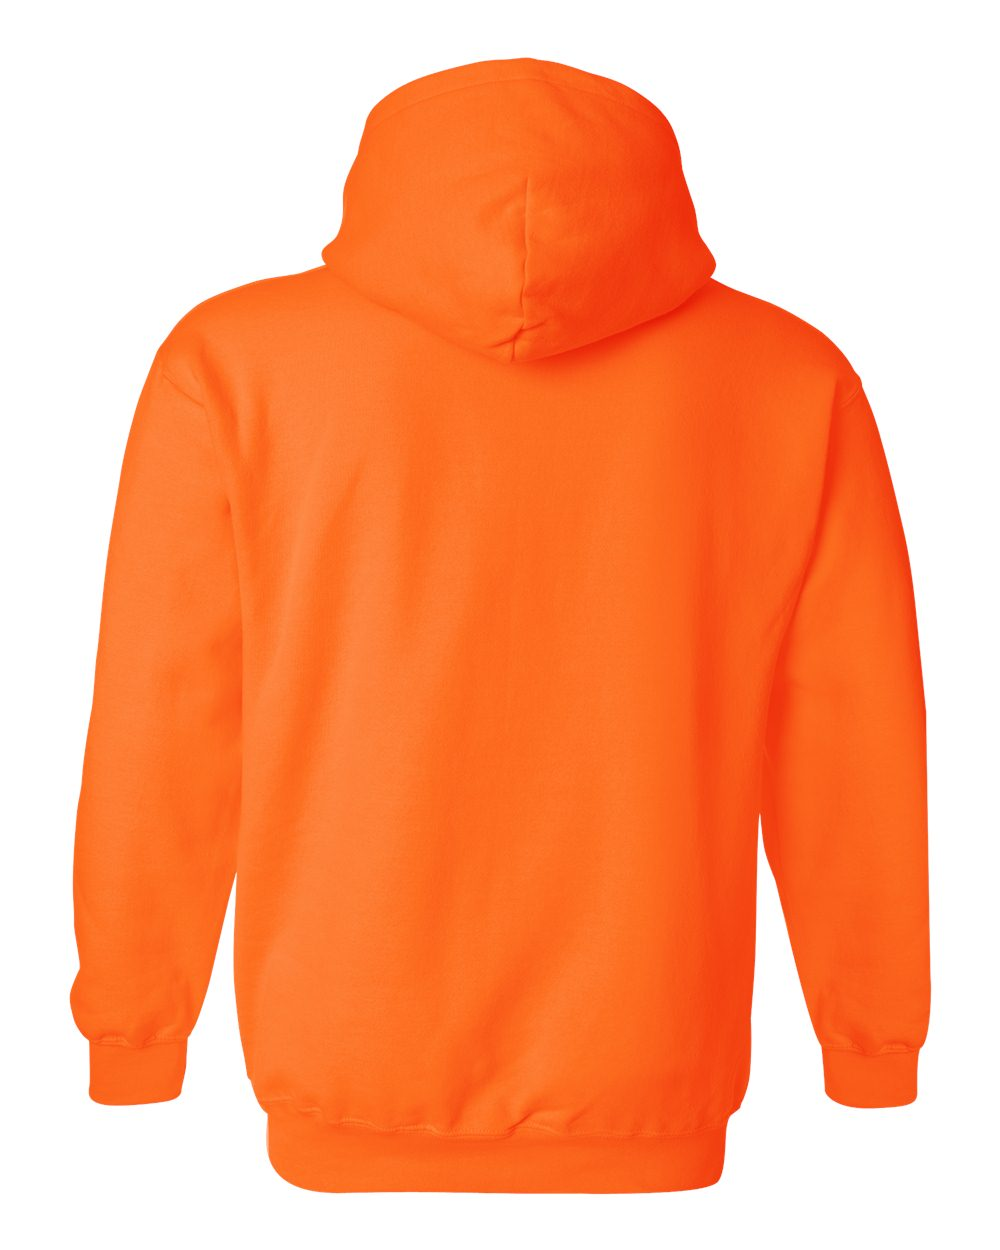 Gildan-Mens-Blank-Hoodie-Heavy-Blend-Hooded-Sweatshirt-Solid-18500-up-to-5XL thumbnail 84